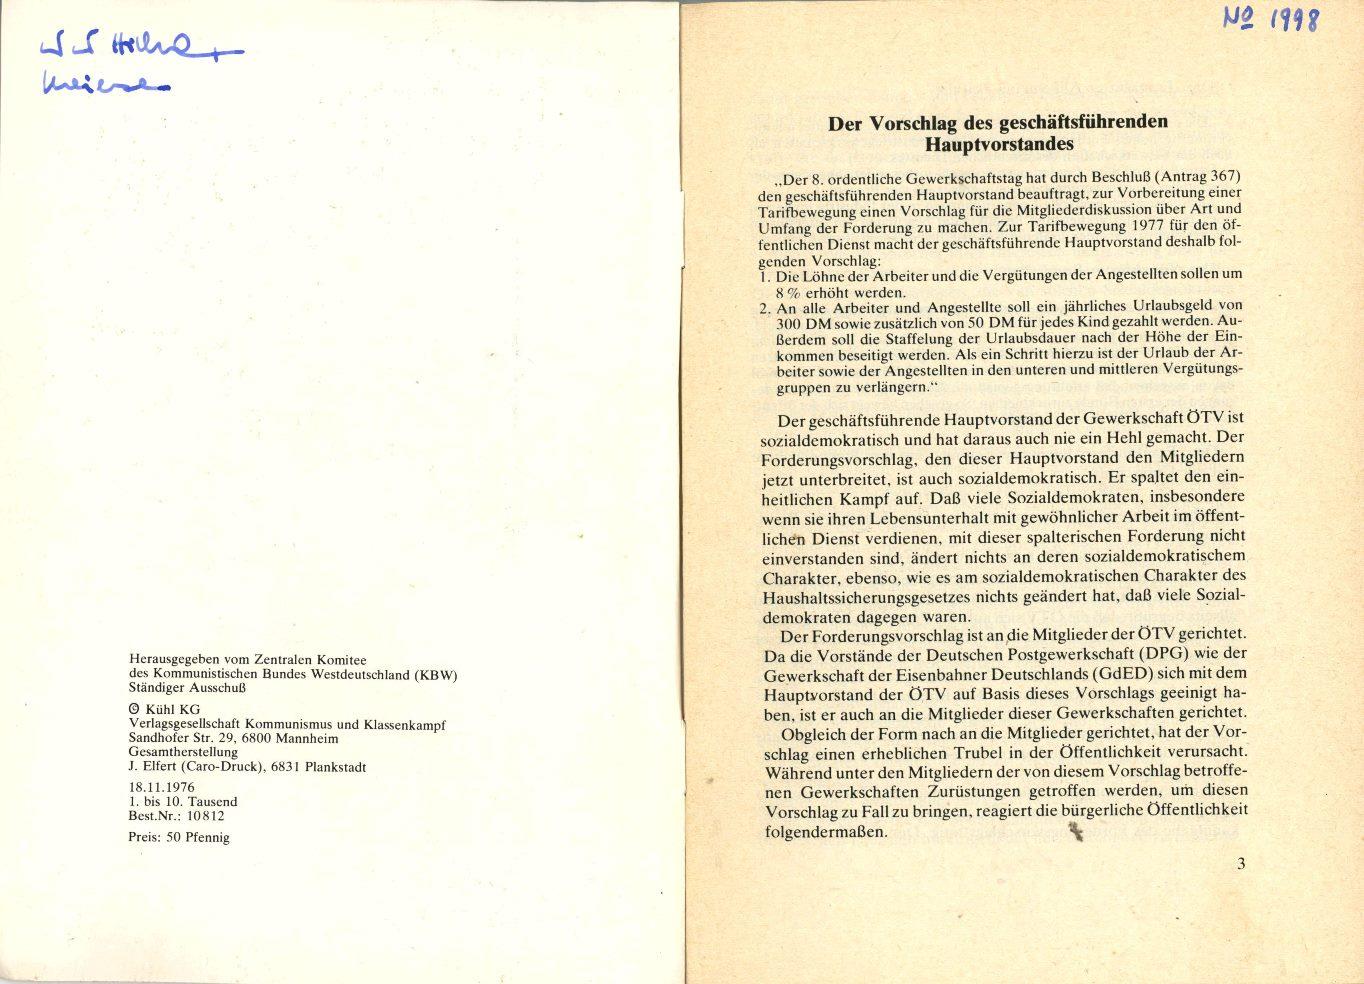 OTV_KBW_Klassenversoehnung_1976_02